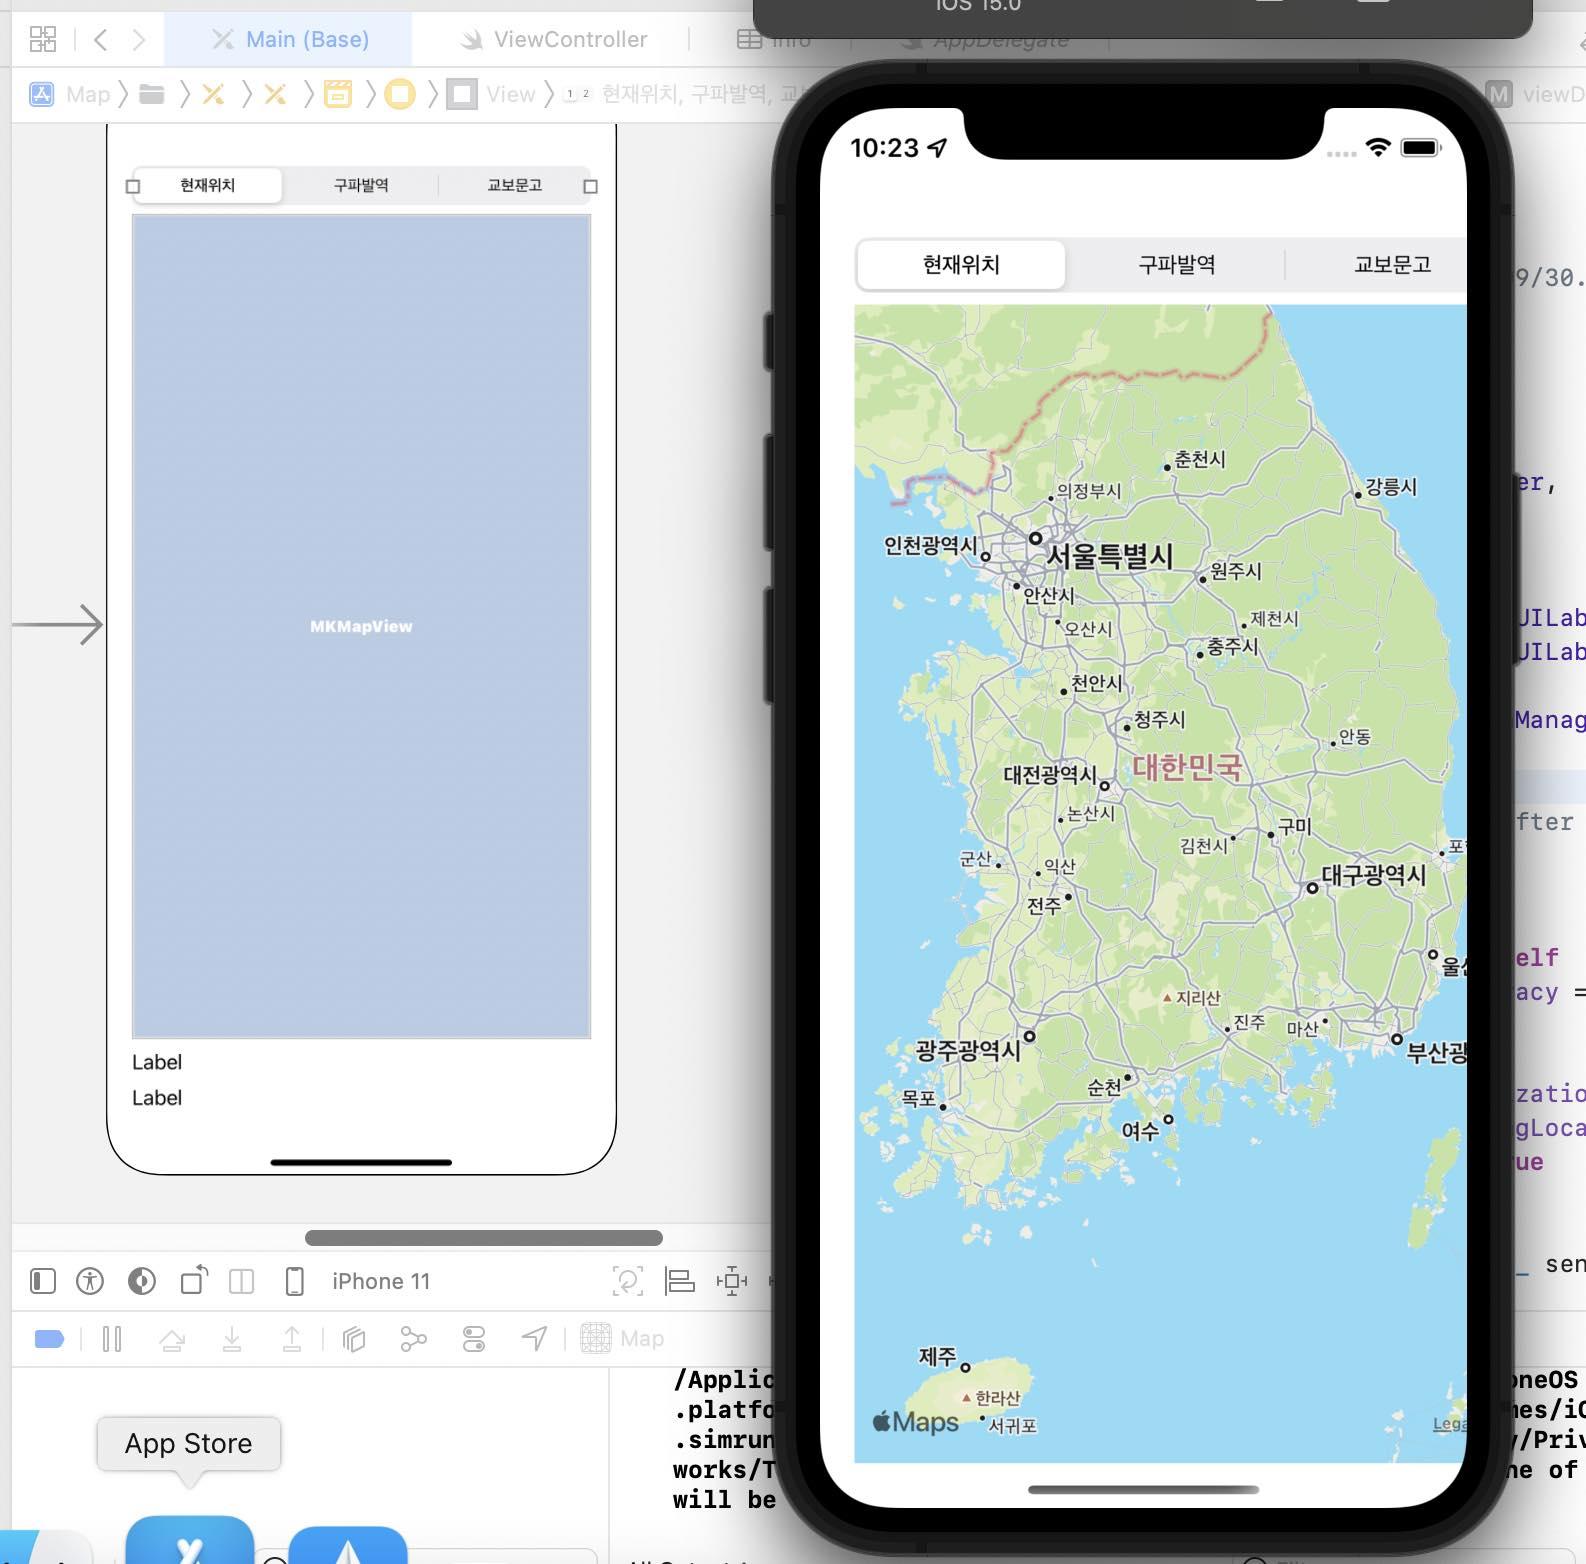 mapview-resize.jpg